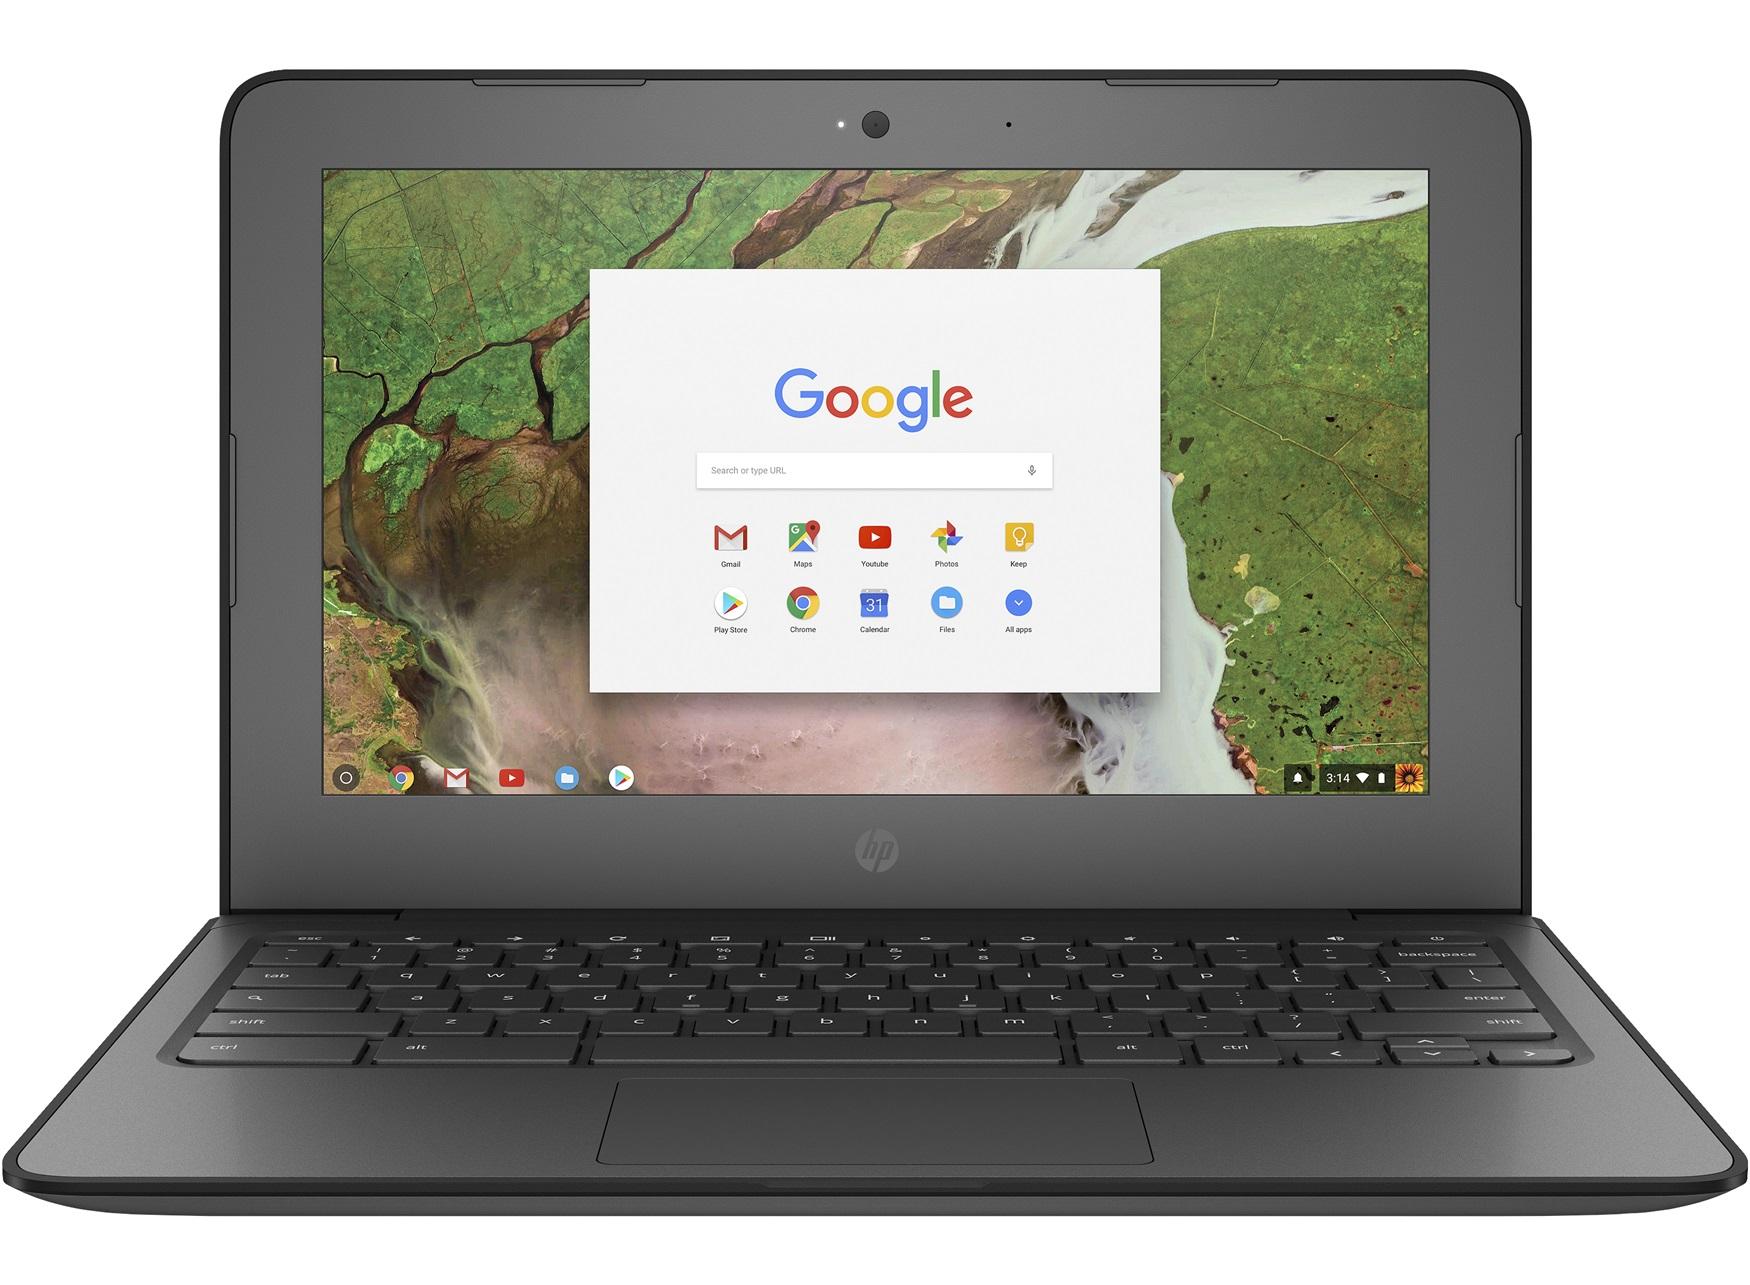 Hewlett-Packard, CB, 11, G6, CEL-N3350, 4GB, 32GB, CHROME,